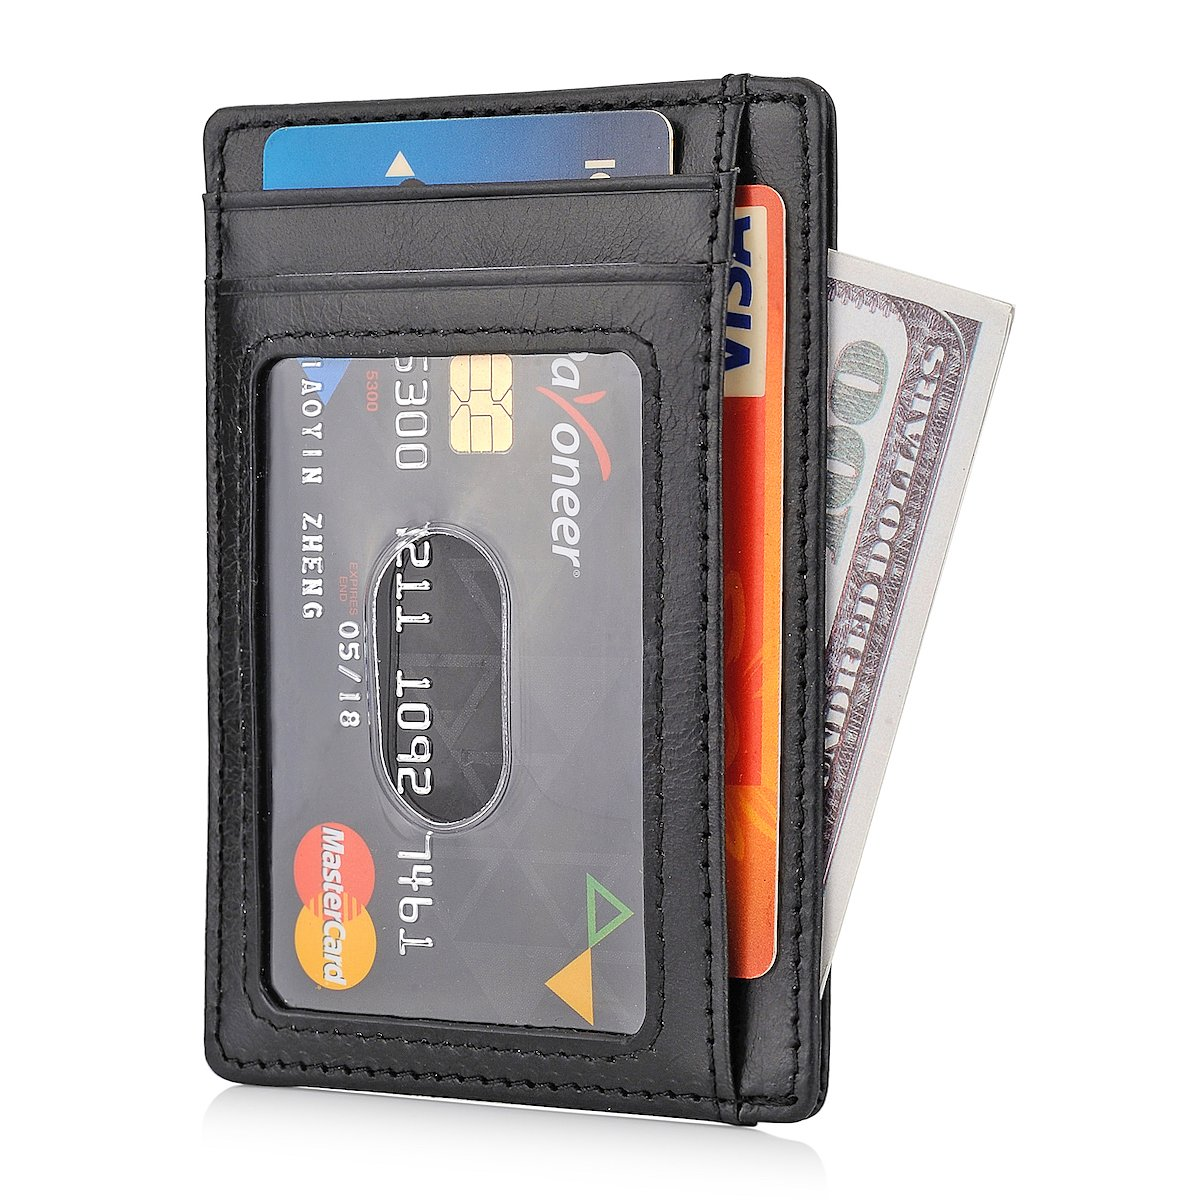 GH GOLD HORSE Slim RFID Blocking Card Holder Minimalist Leather Front Pocket Wallet for Women (Black) by GH GOLD HORSE (Image #2)